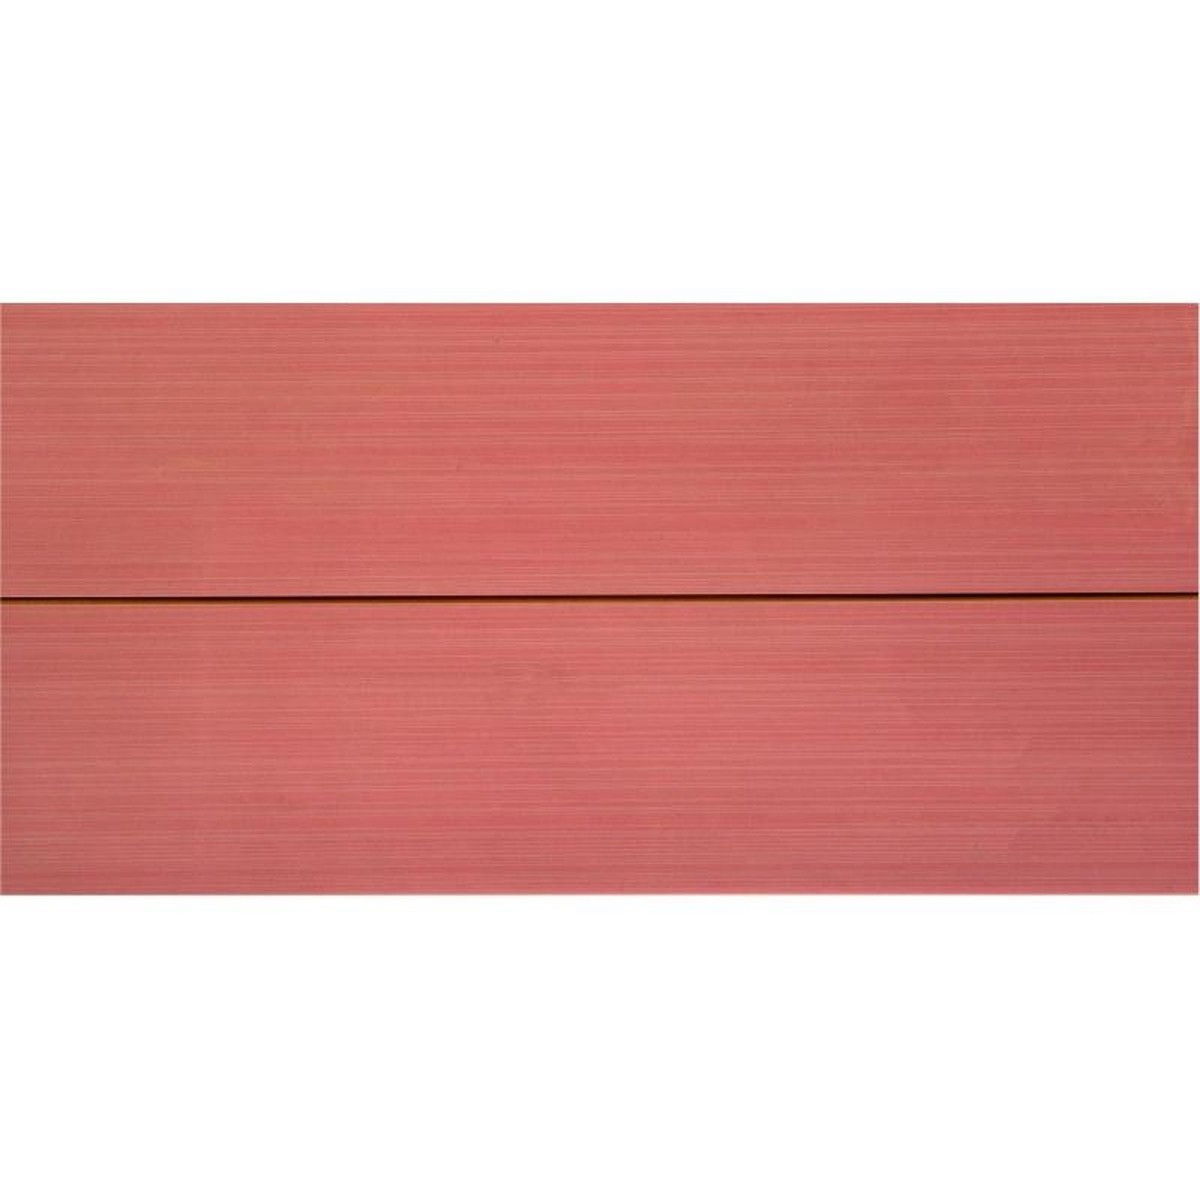 Вставка Фрэска 2 20х40 см цвет розовый